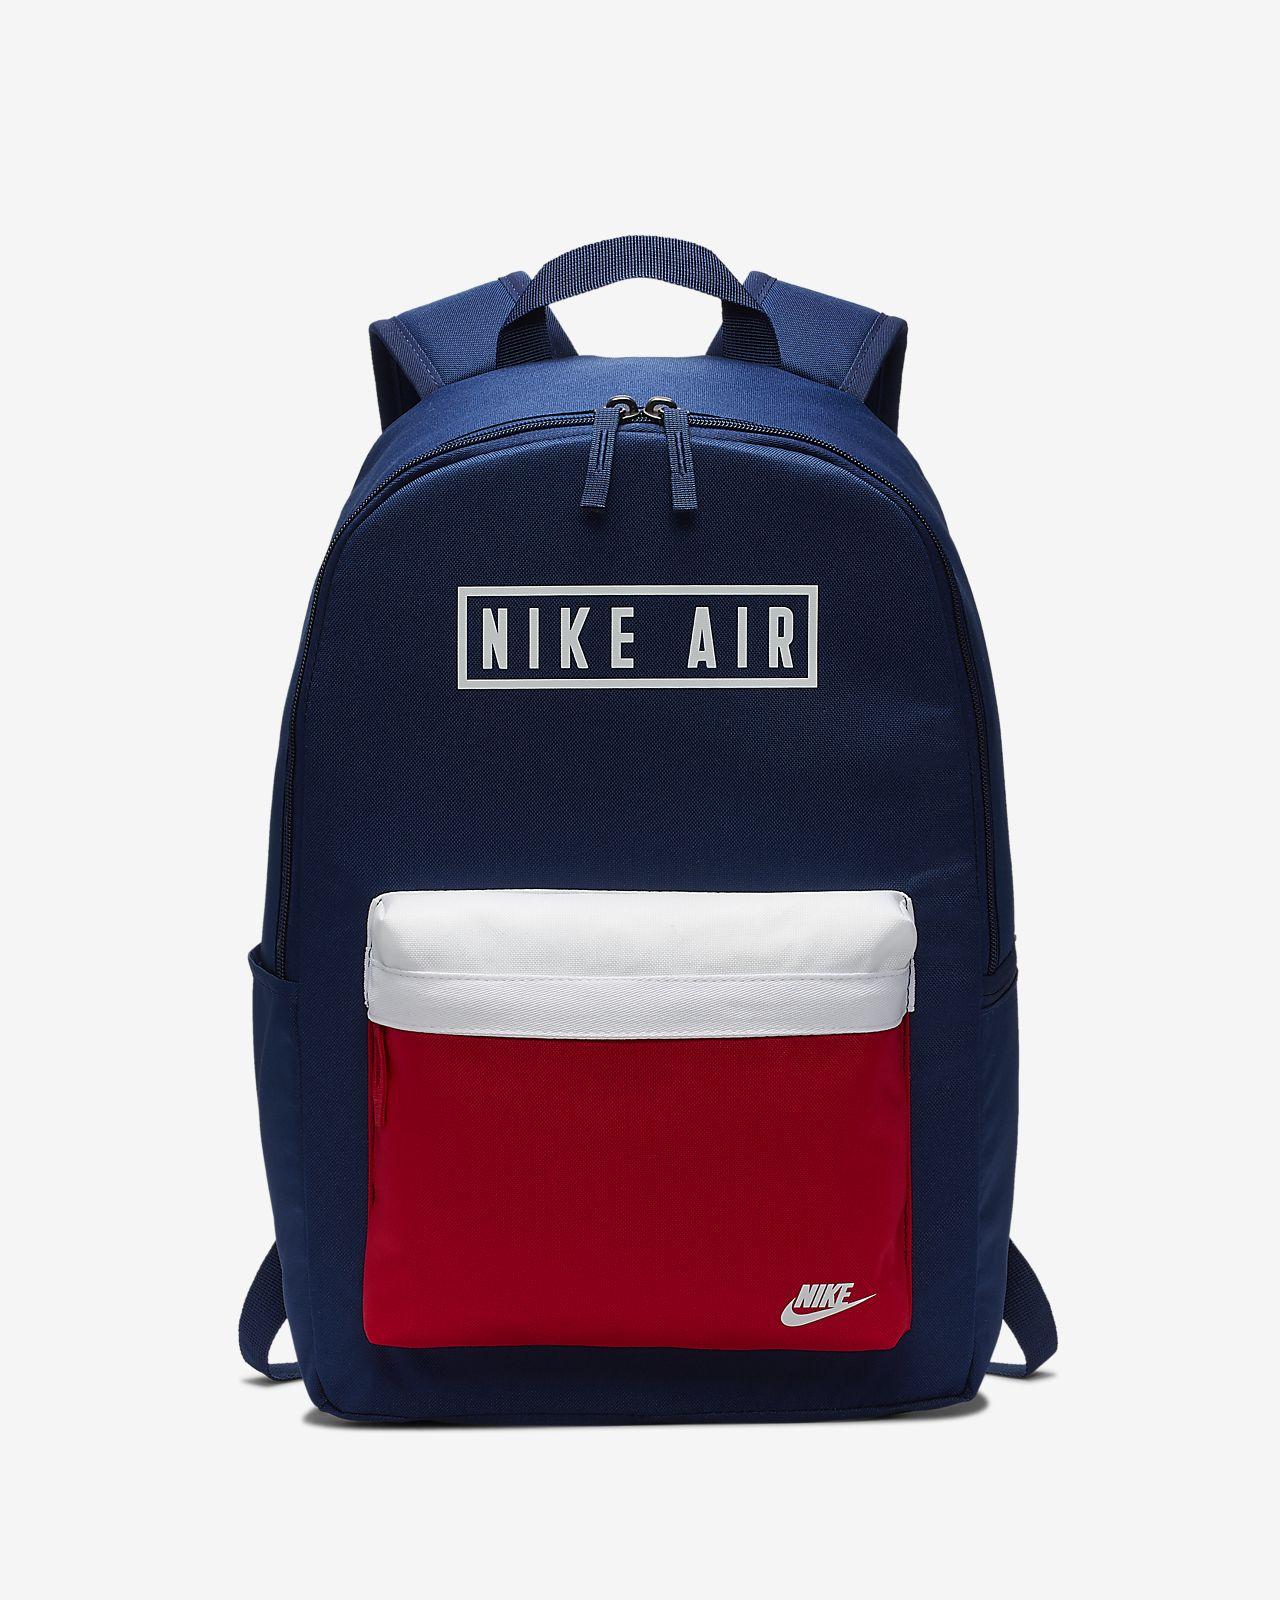 c46257c72c5 Nike Air Heritage 2.0 Graphic Backpack. Nike.com NL